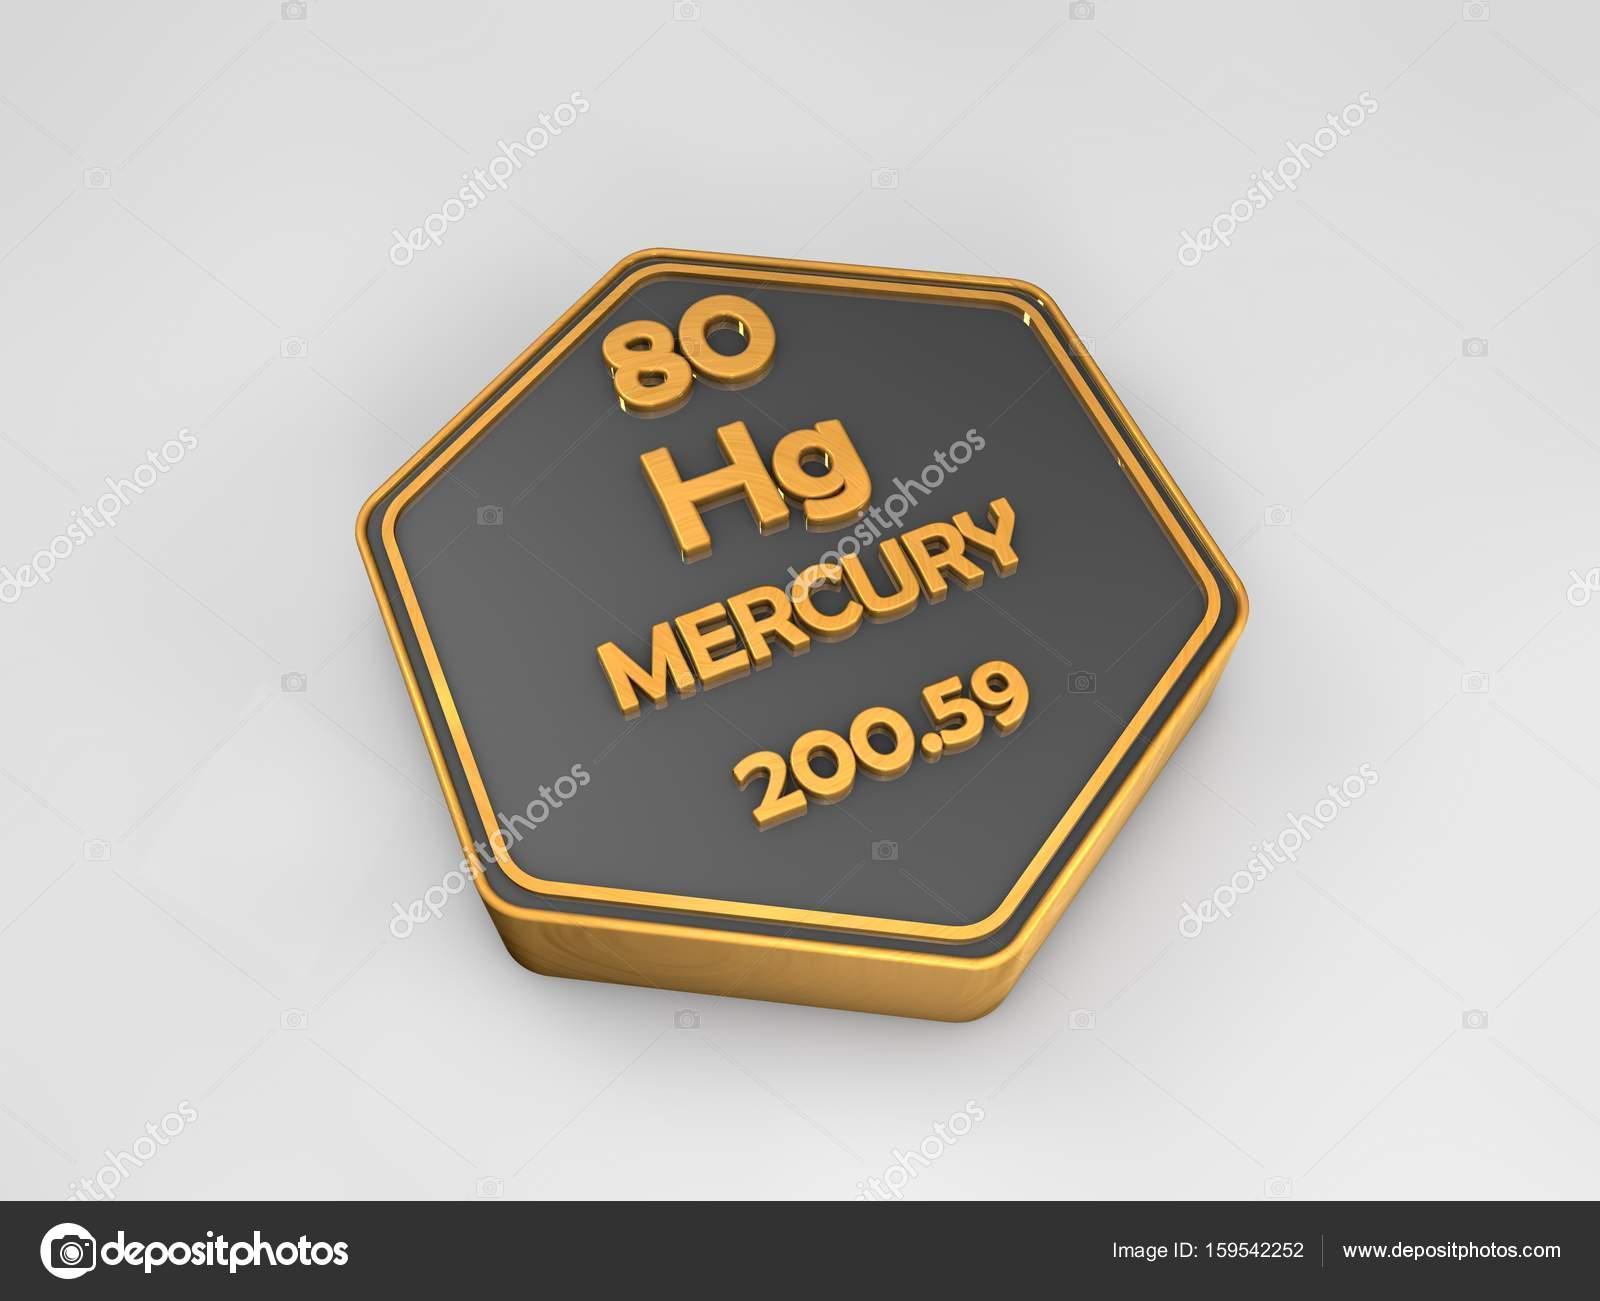 Mercurio hg elemento qumico tabla peridica forma hexagonal 3d mercurio hg elemento qumico tabla peridica forma hexagonal 3d render foto de stock urtaz Gallery